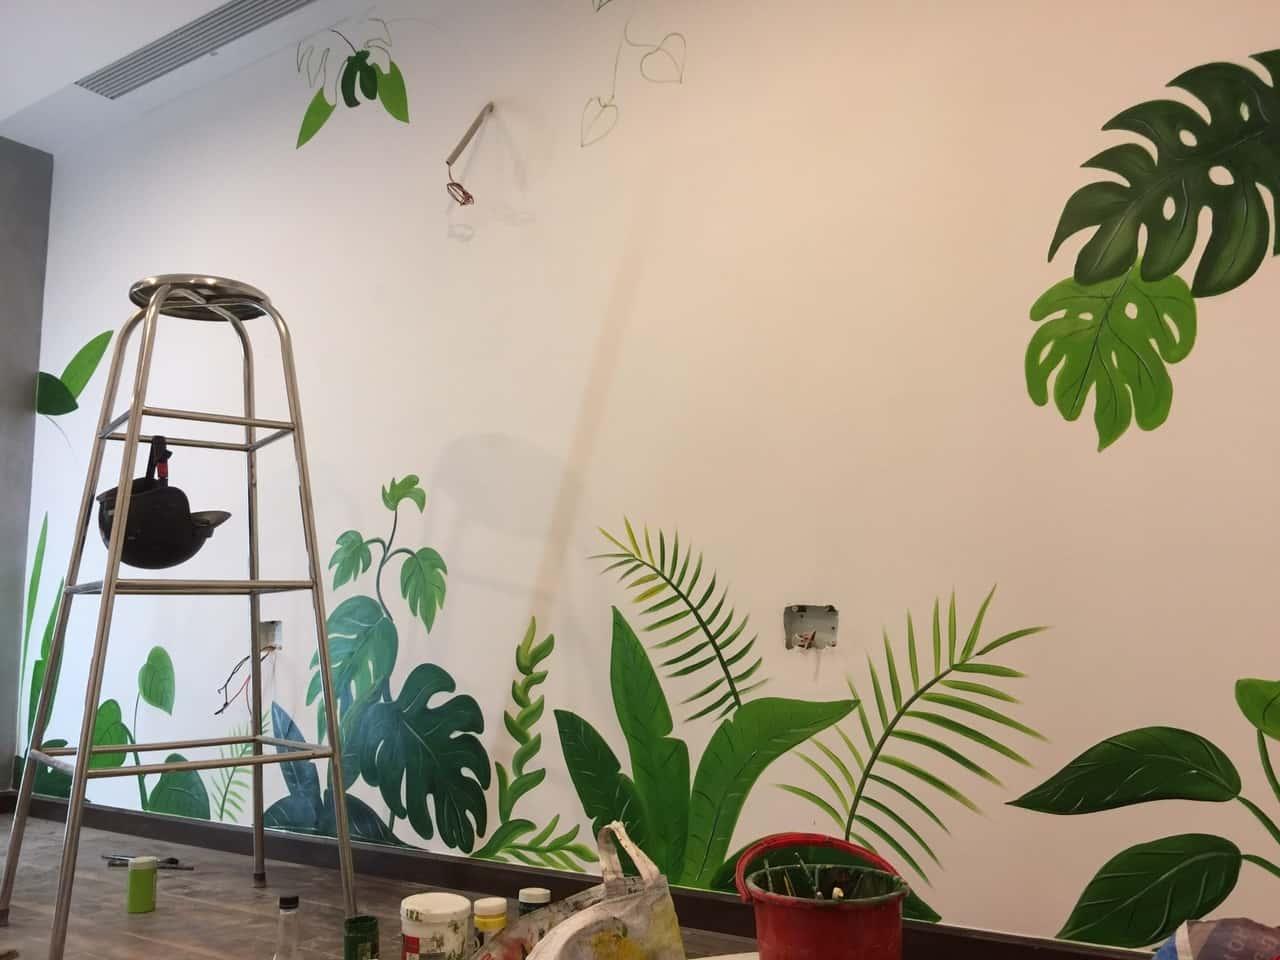 tranh tuong spa - Vẽ tranh tường cho spa